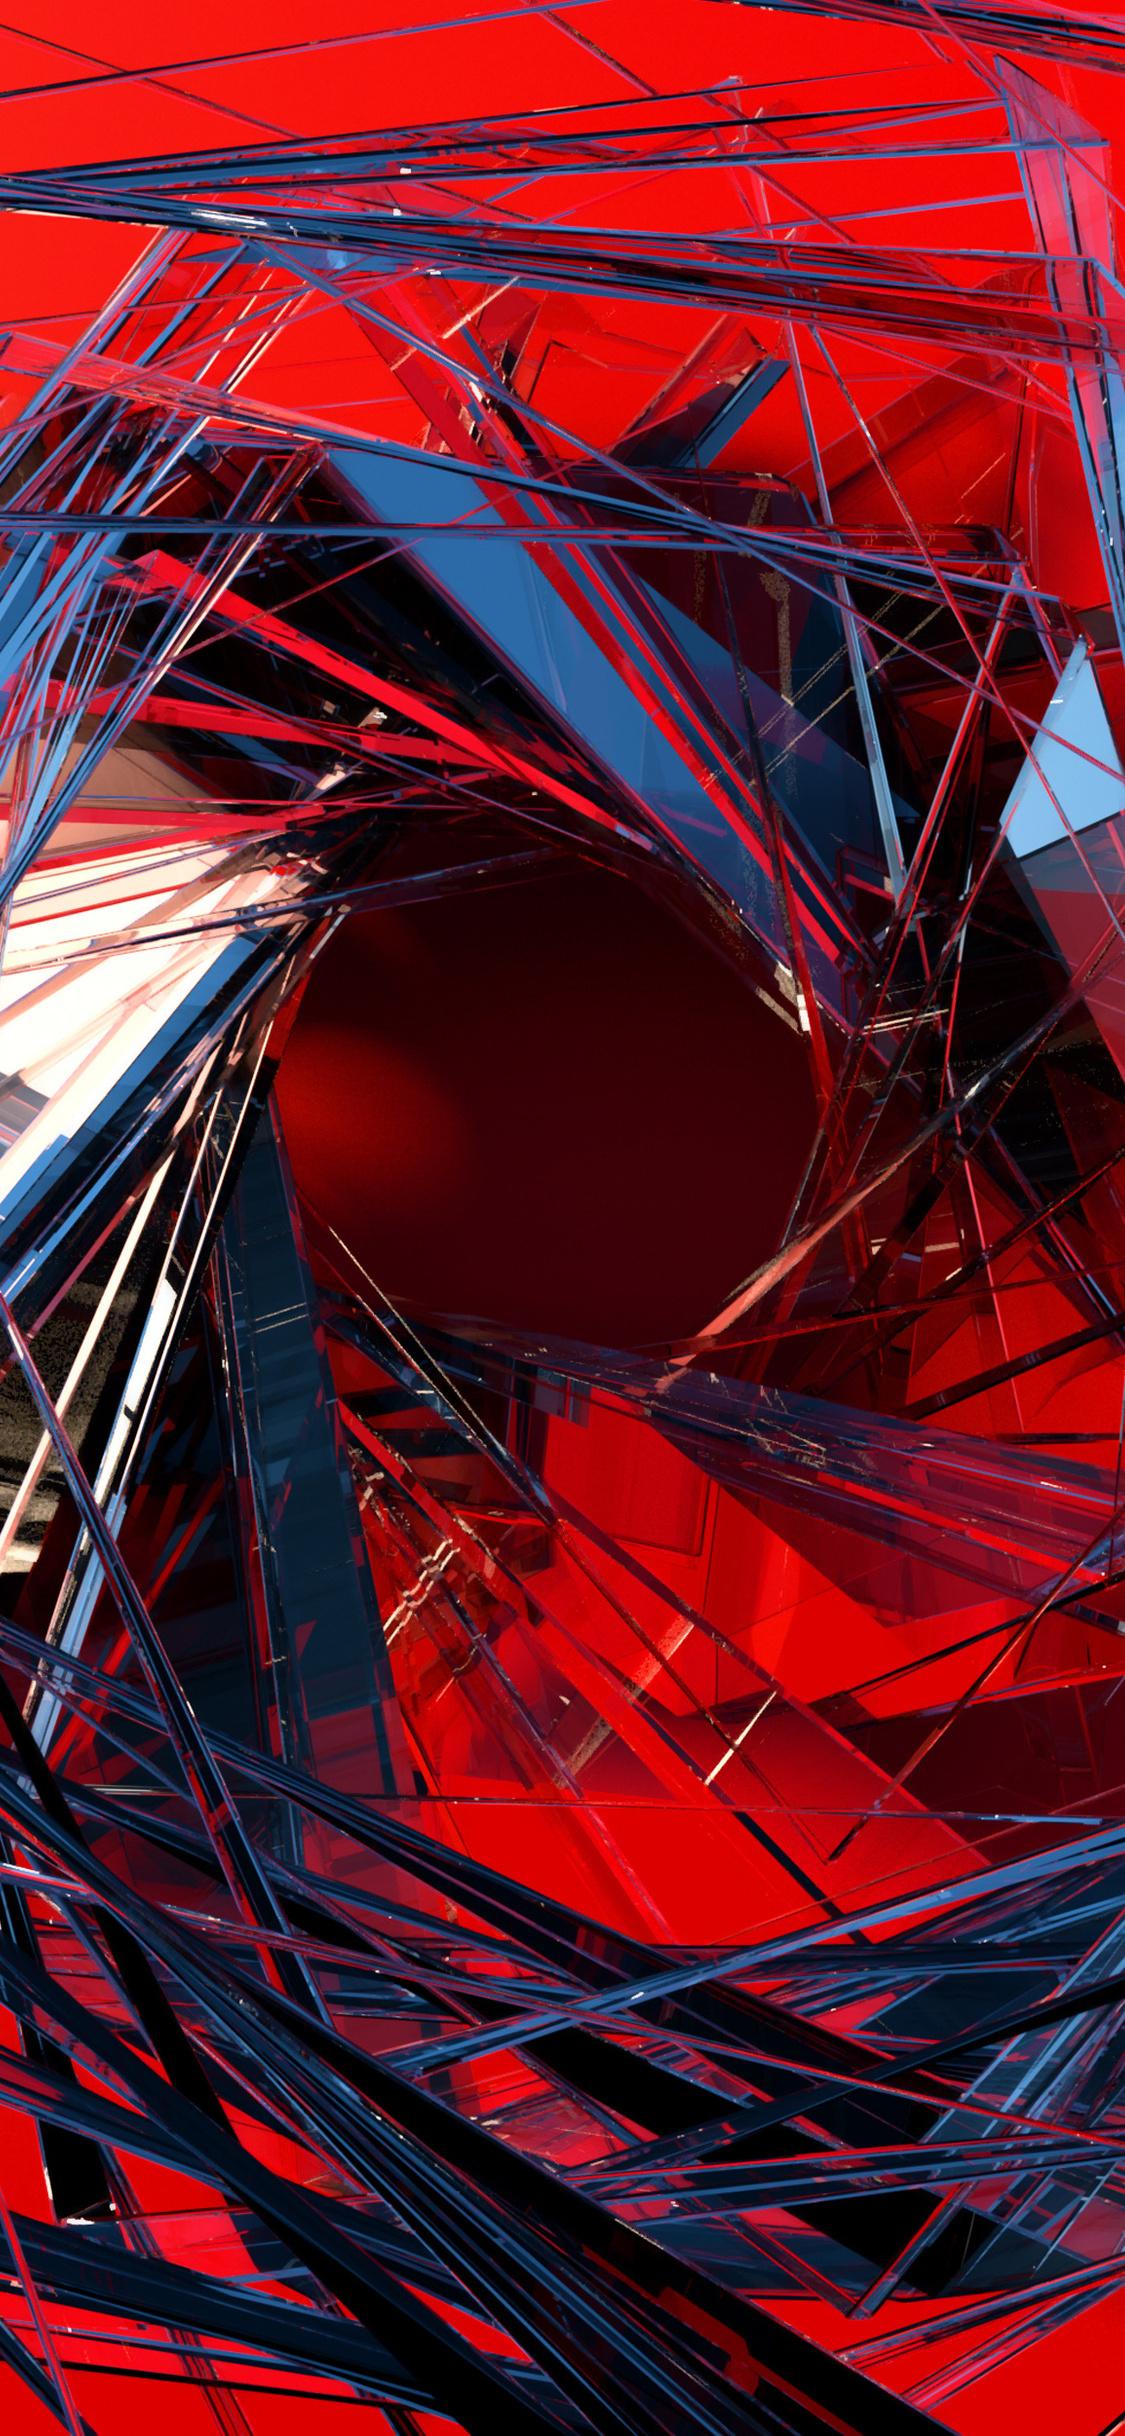 3d glass abstract art no